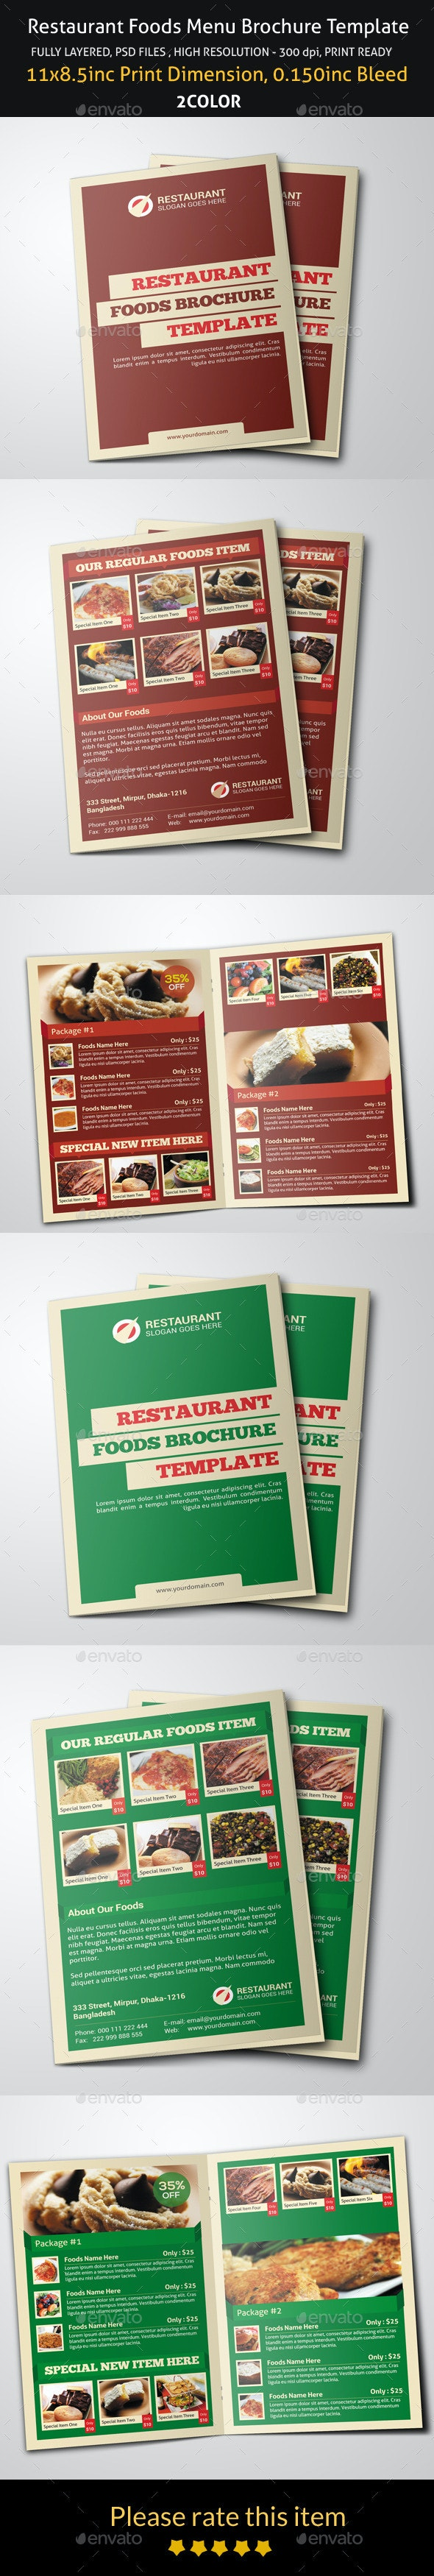 Restaurant Foods Menu Brochure Template - Brochures Print Templates